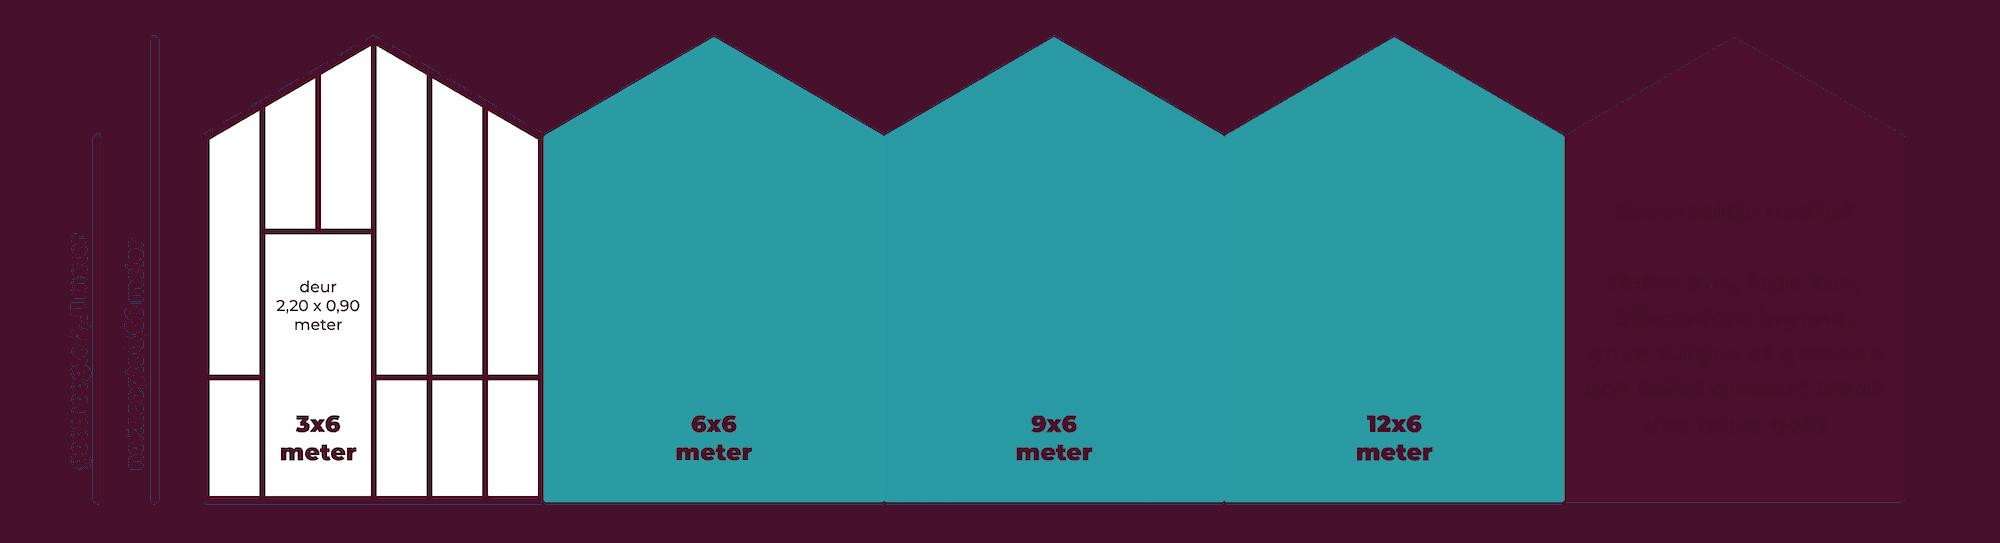 Kassen en maatwerk - buitelaar verhuurt